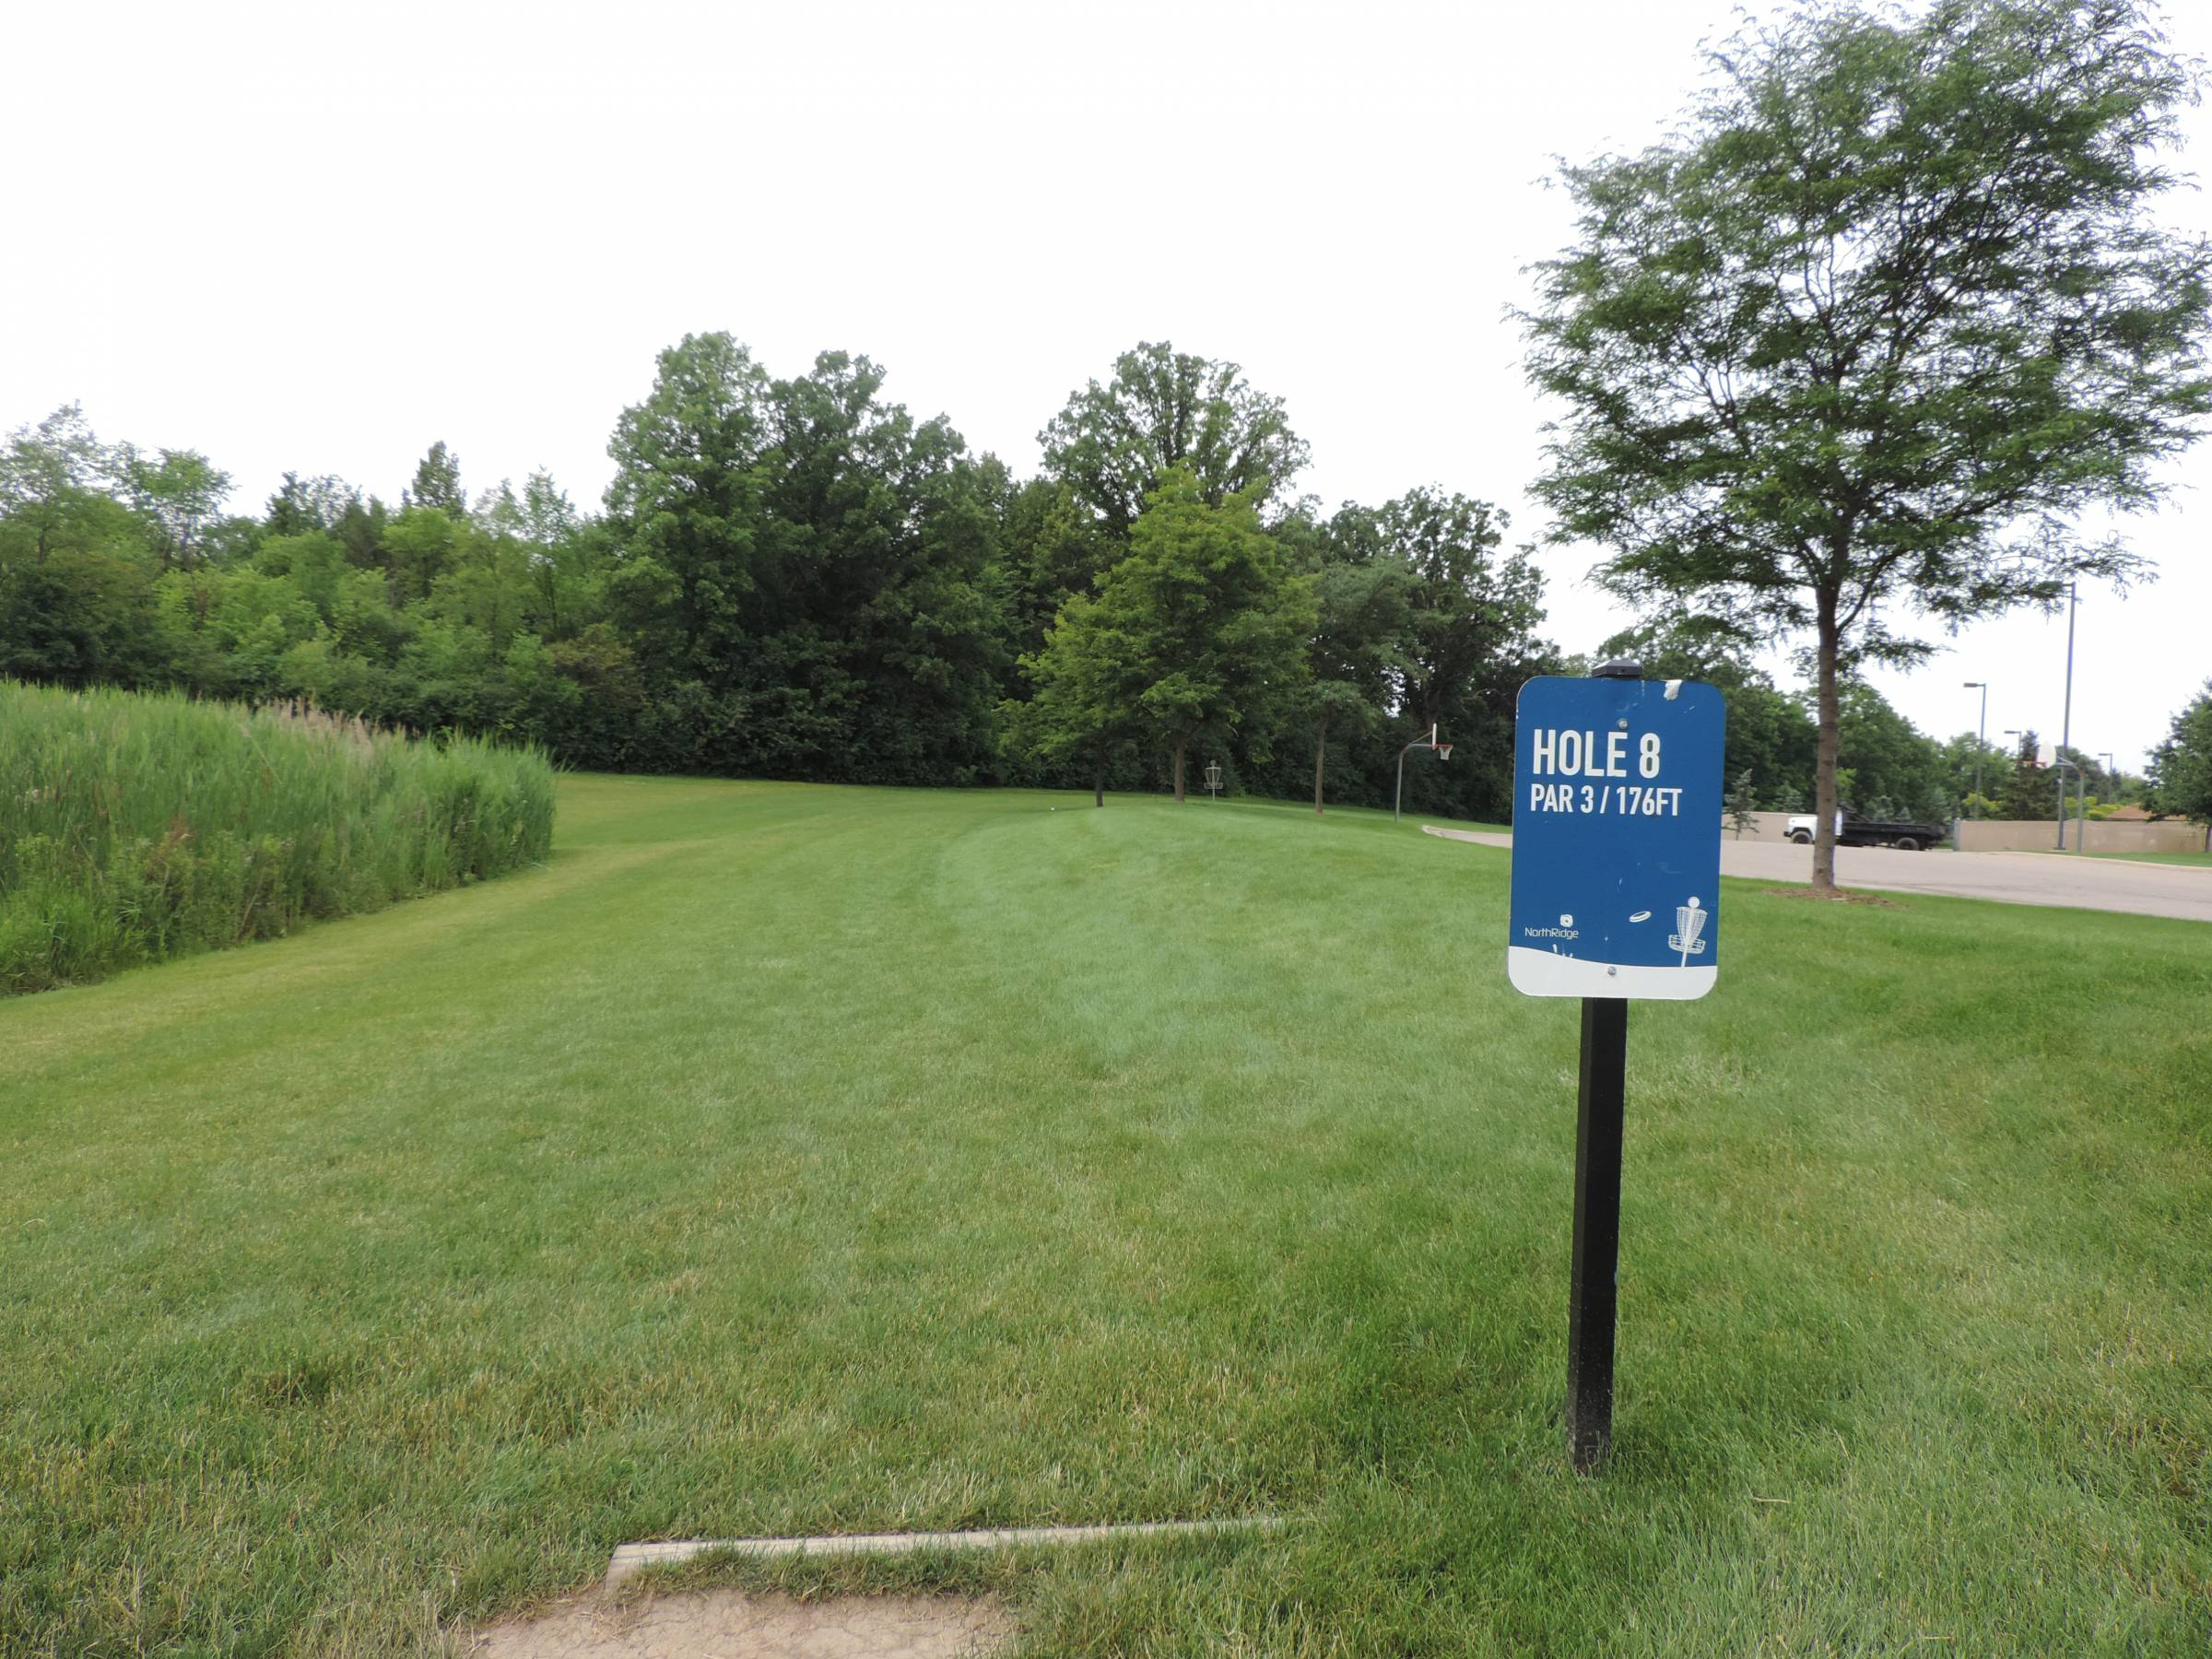 Hole 8 • NorthRidge Church (Plymouth, MI) | Disc Golf Courses | Disc ...